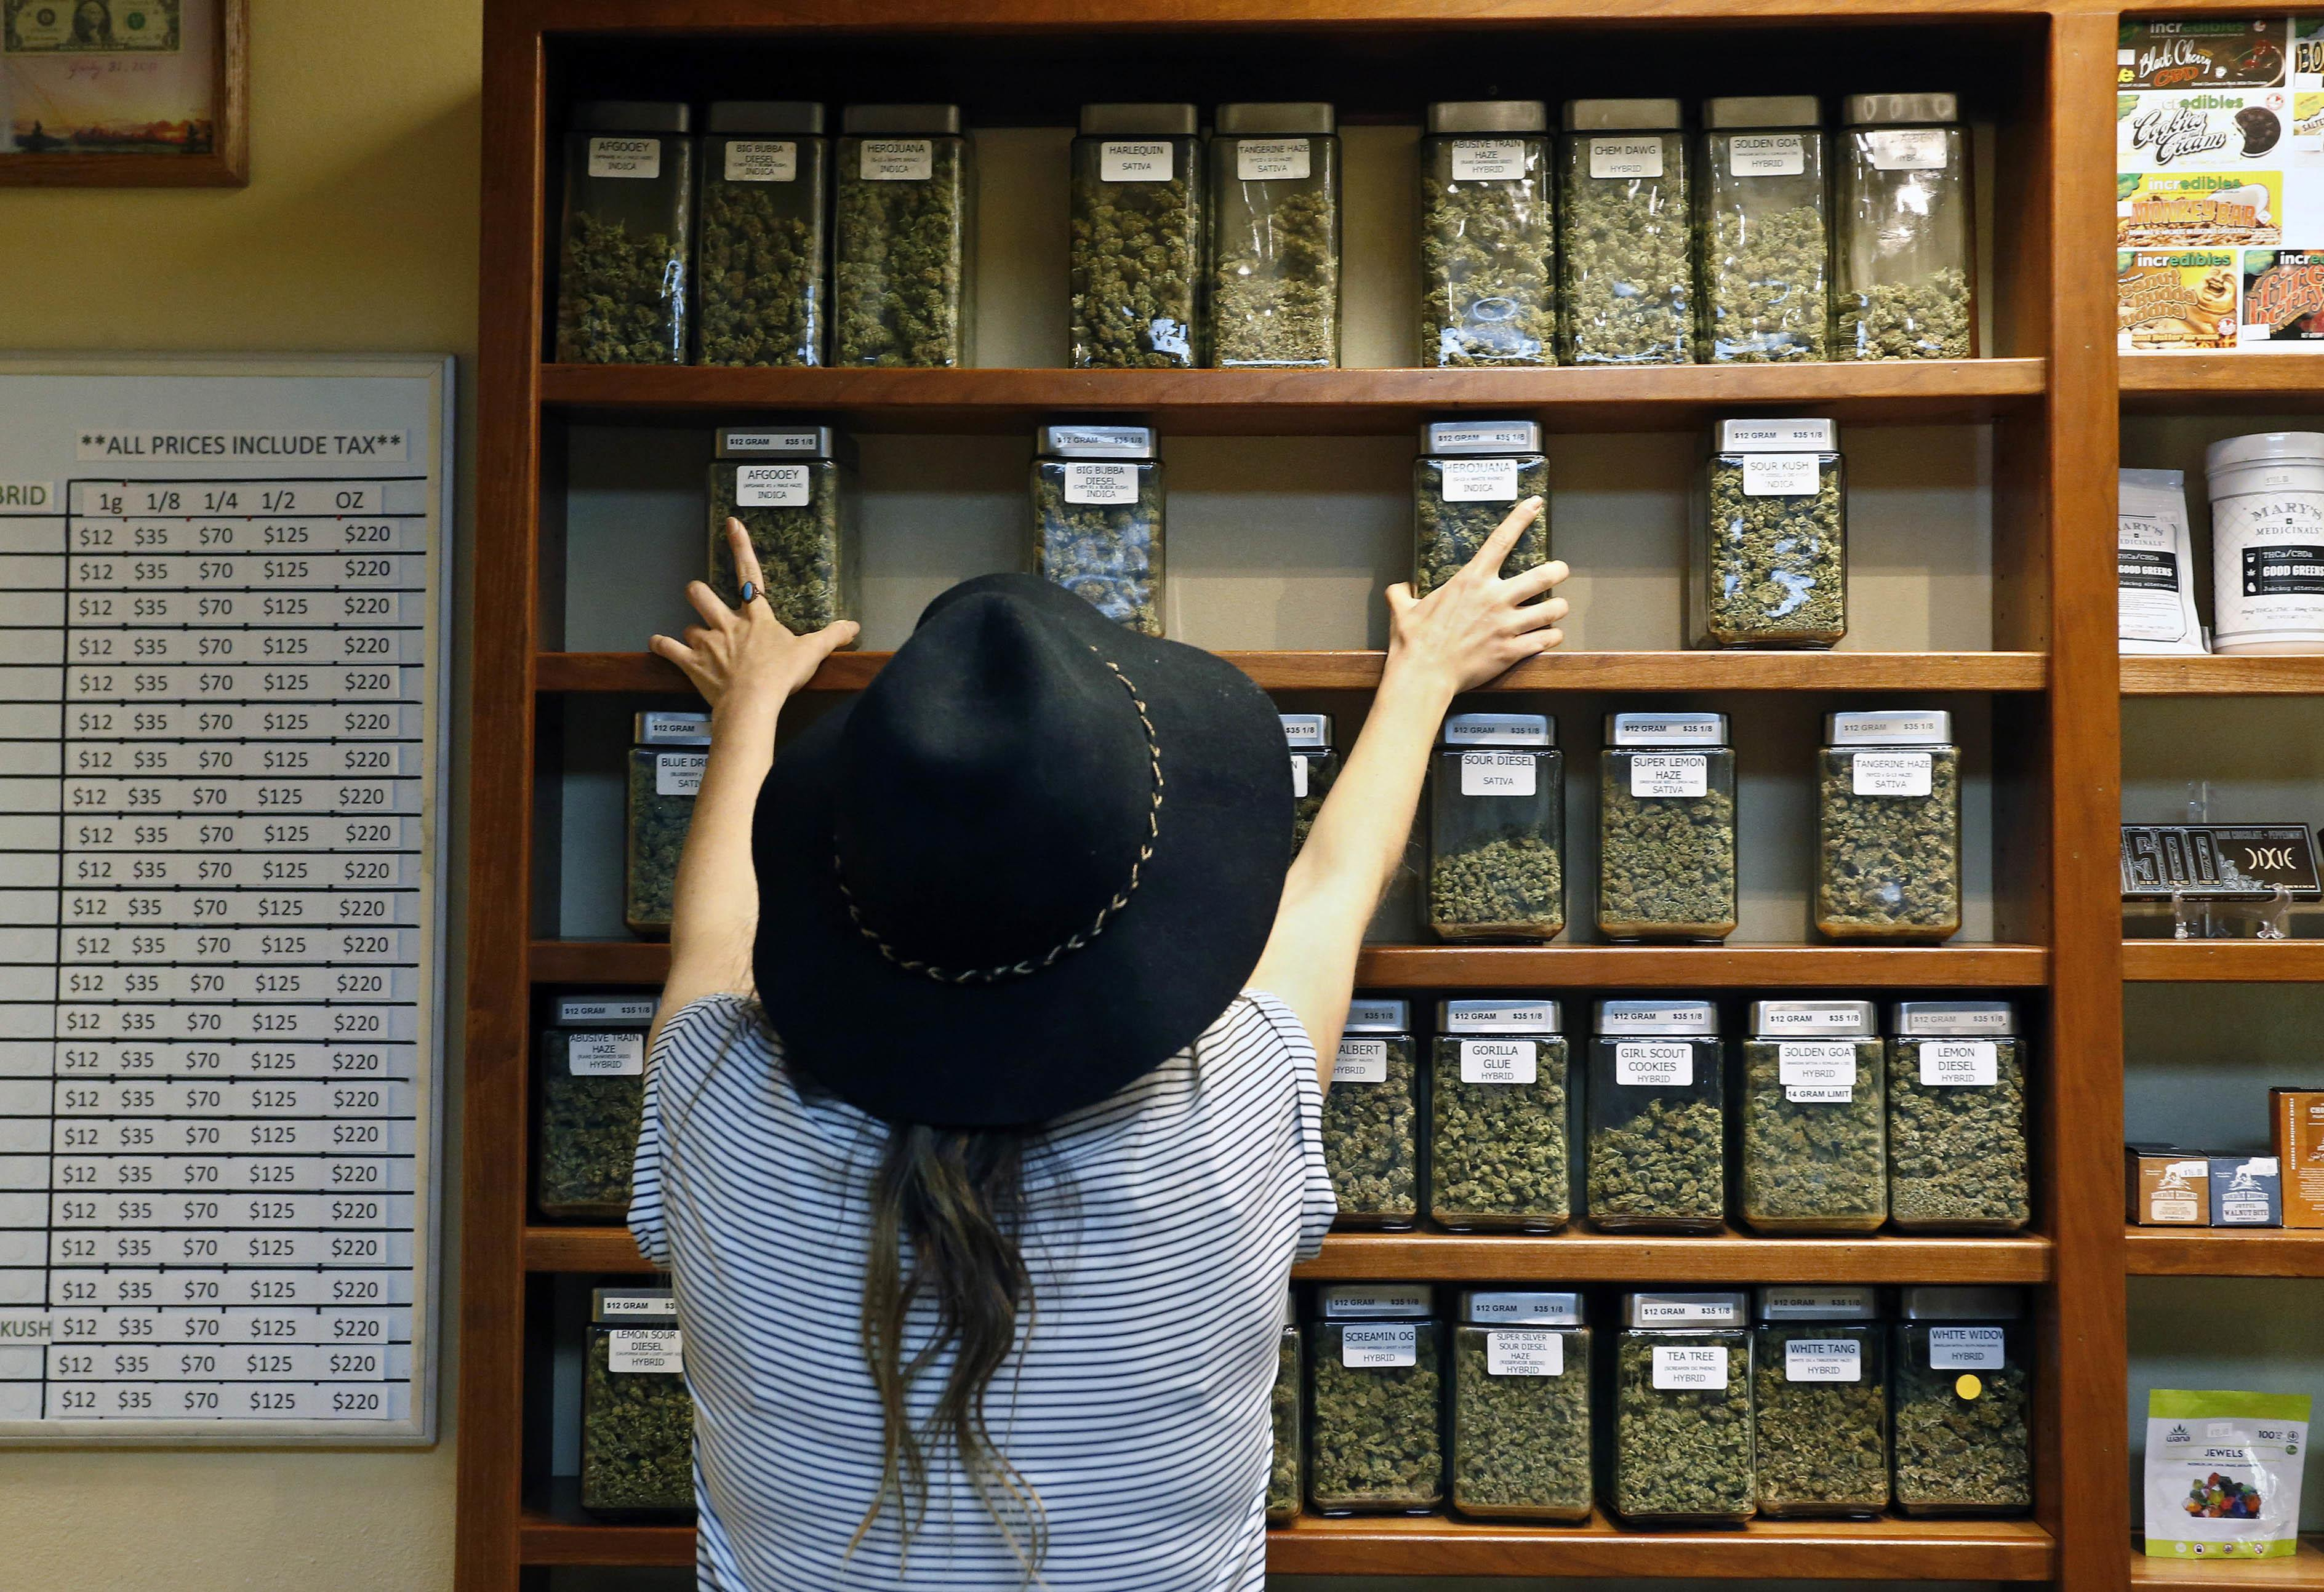 More US adults use marijuana, don't think it's risky